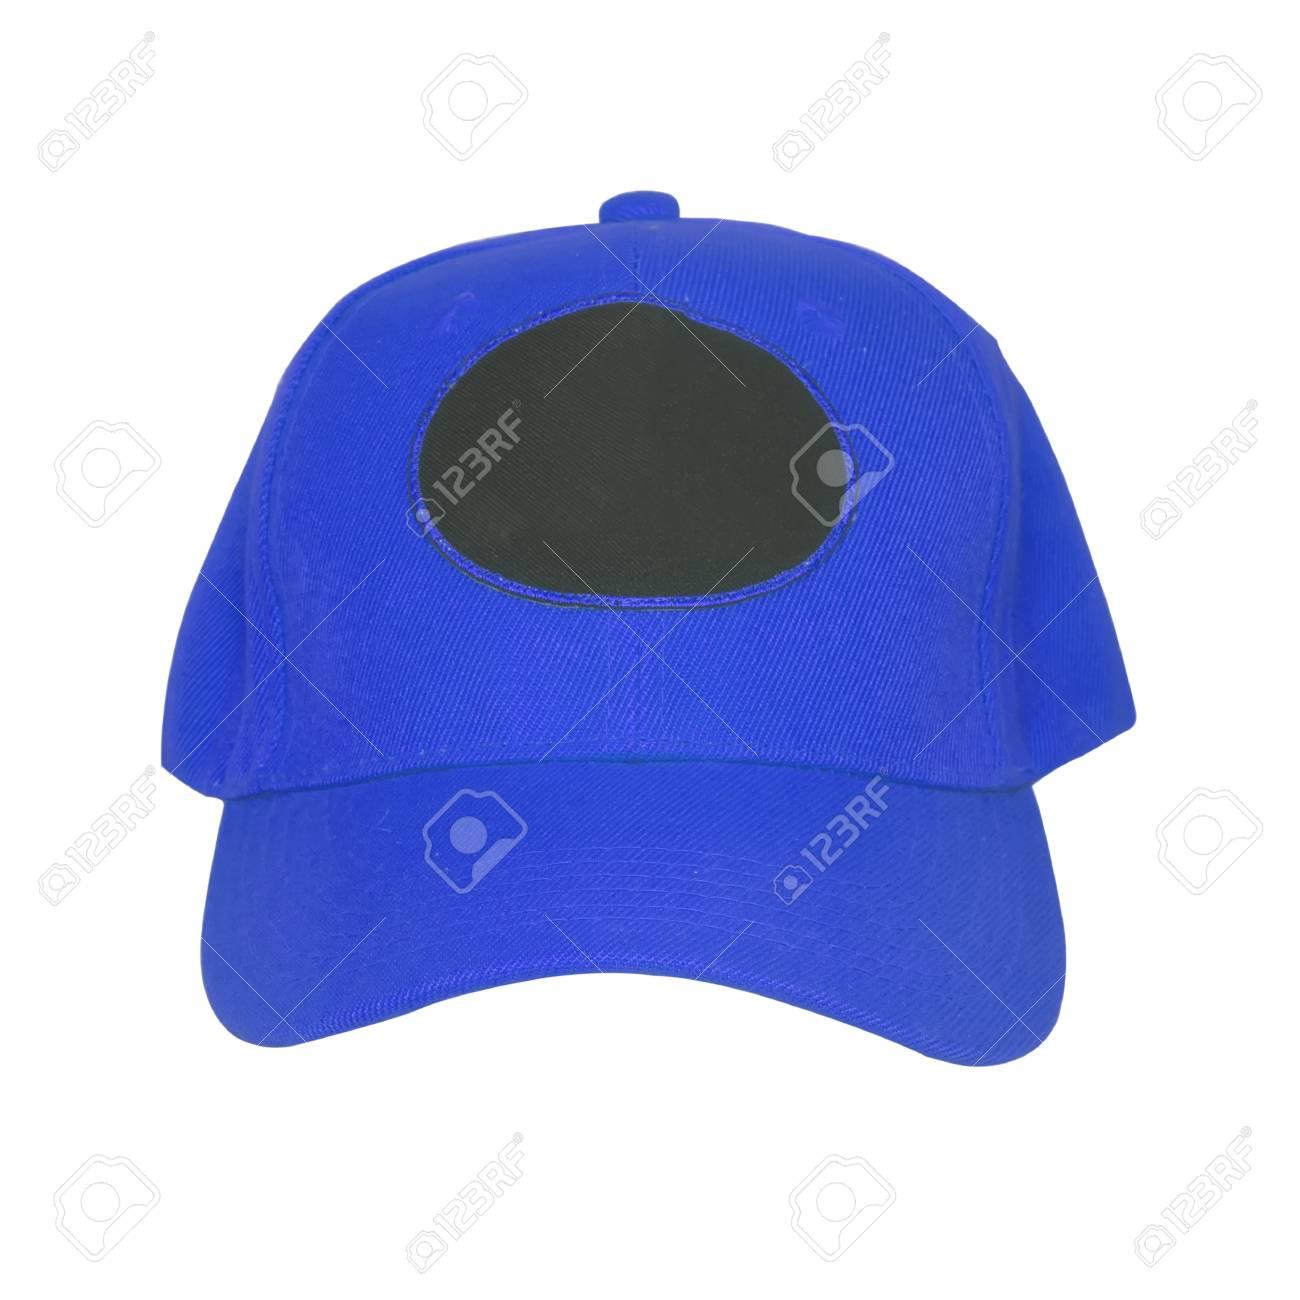 Foto de archivo - Gorra de béisbol azul aislada sobre fondo blanco 351096db0c4